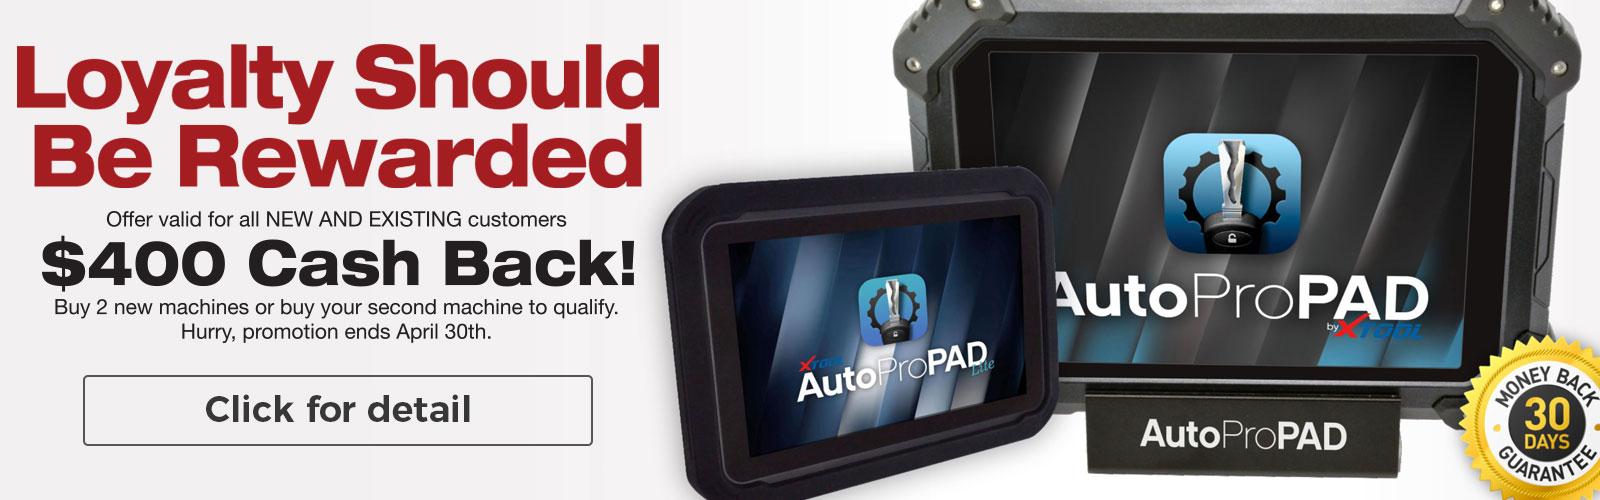 AutoProPad Cashback